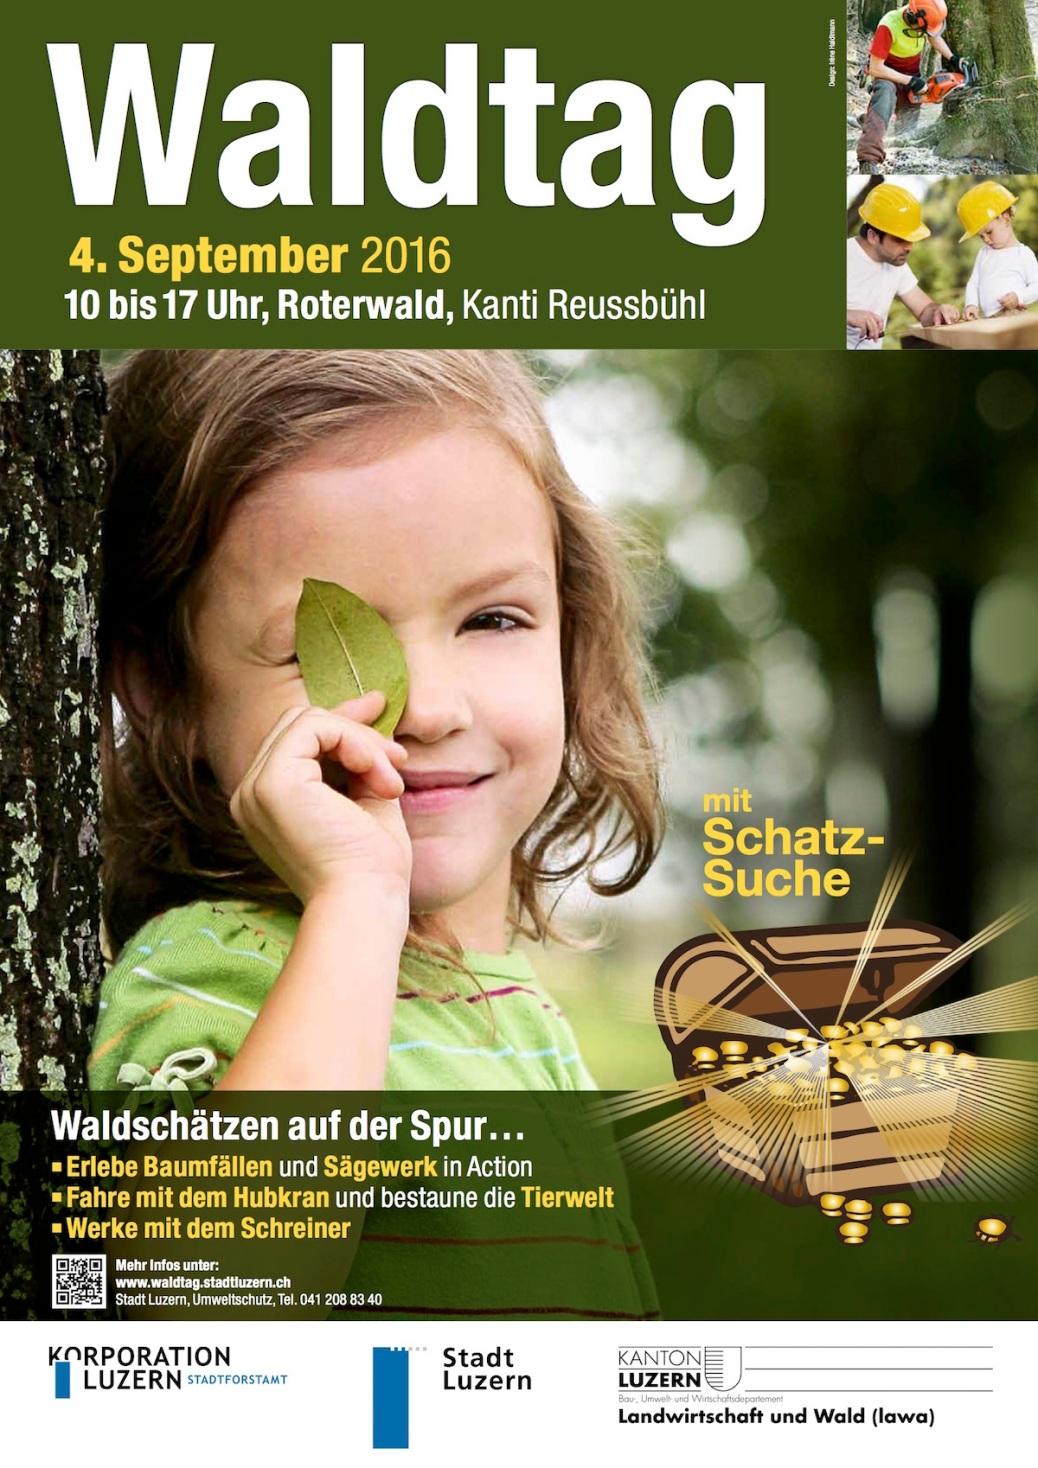 Plakat_A3_Waldtag_2016_WEB